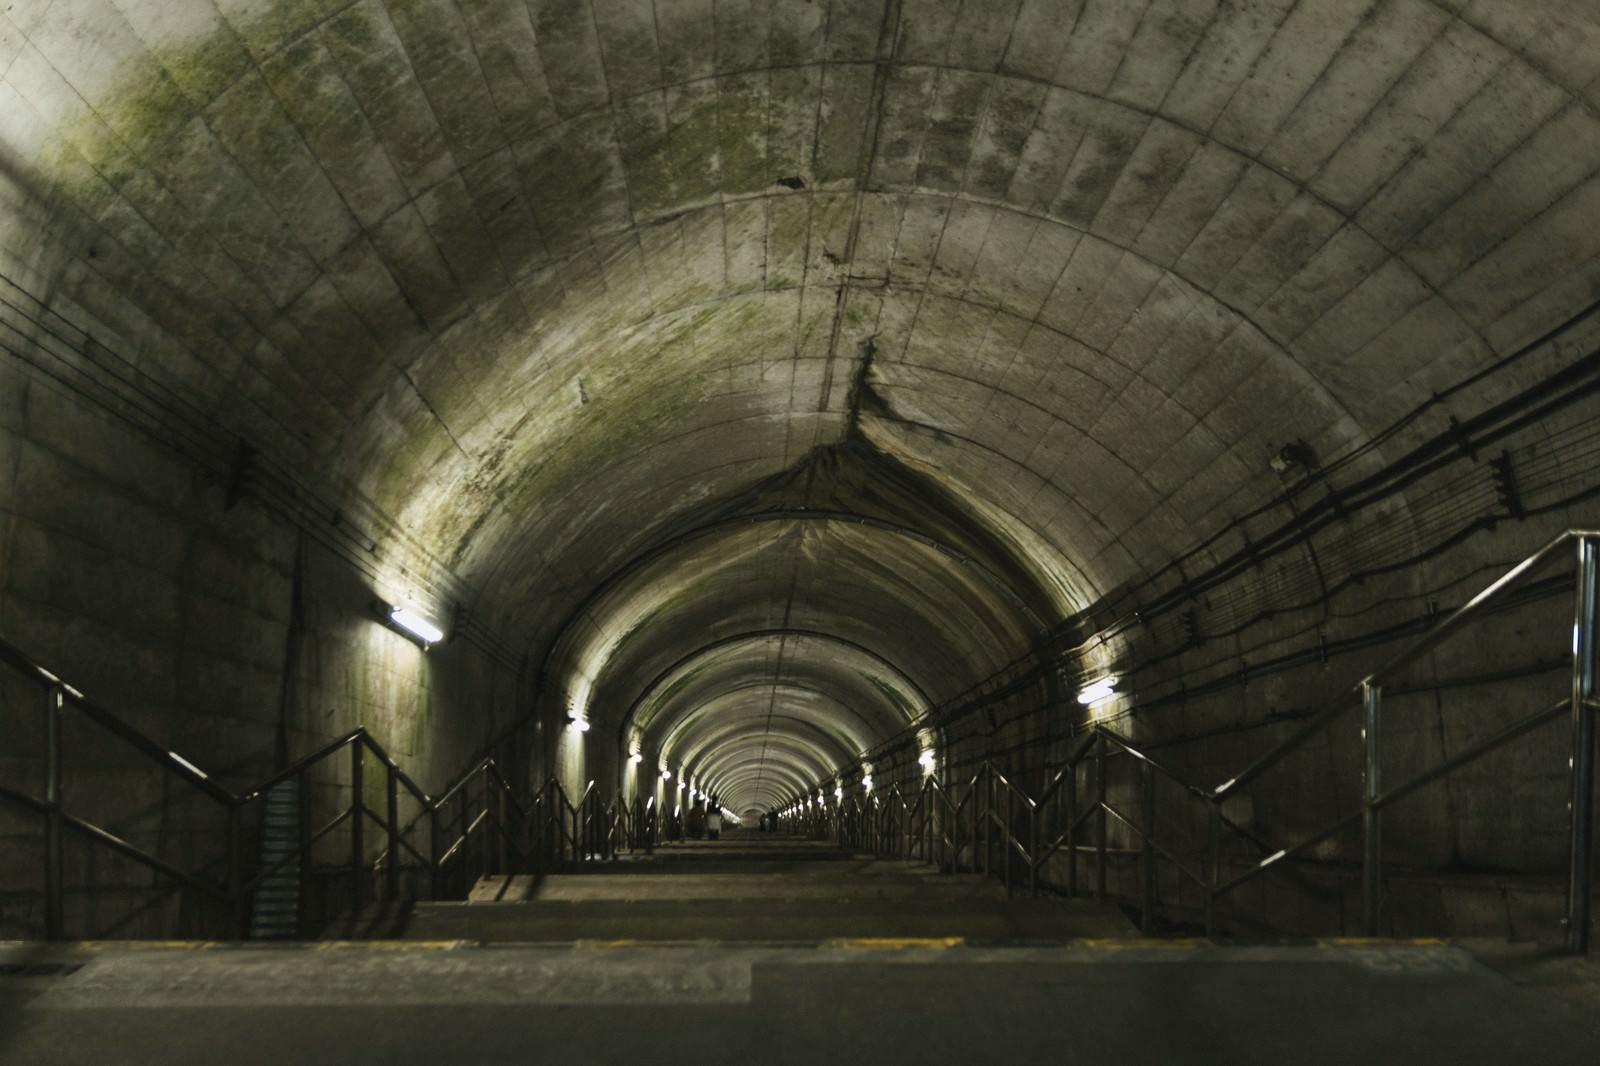 「JR上越線土合駅地下ホームに向かう階段JR上越線土合駅地下ホームに向かう階段」のフリー写真素材を拡大